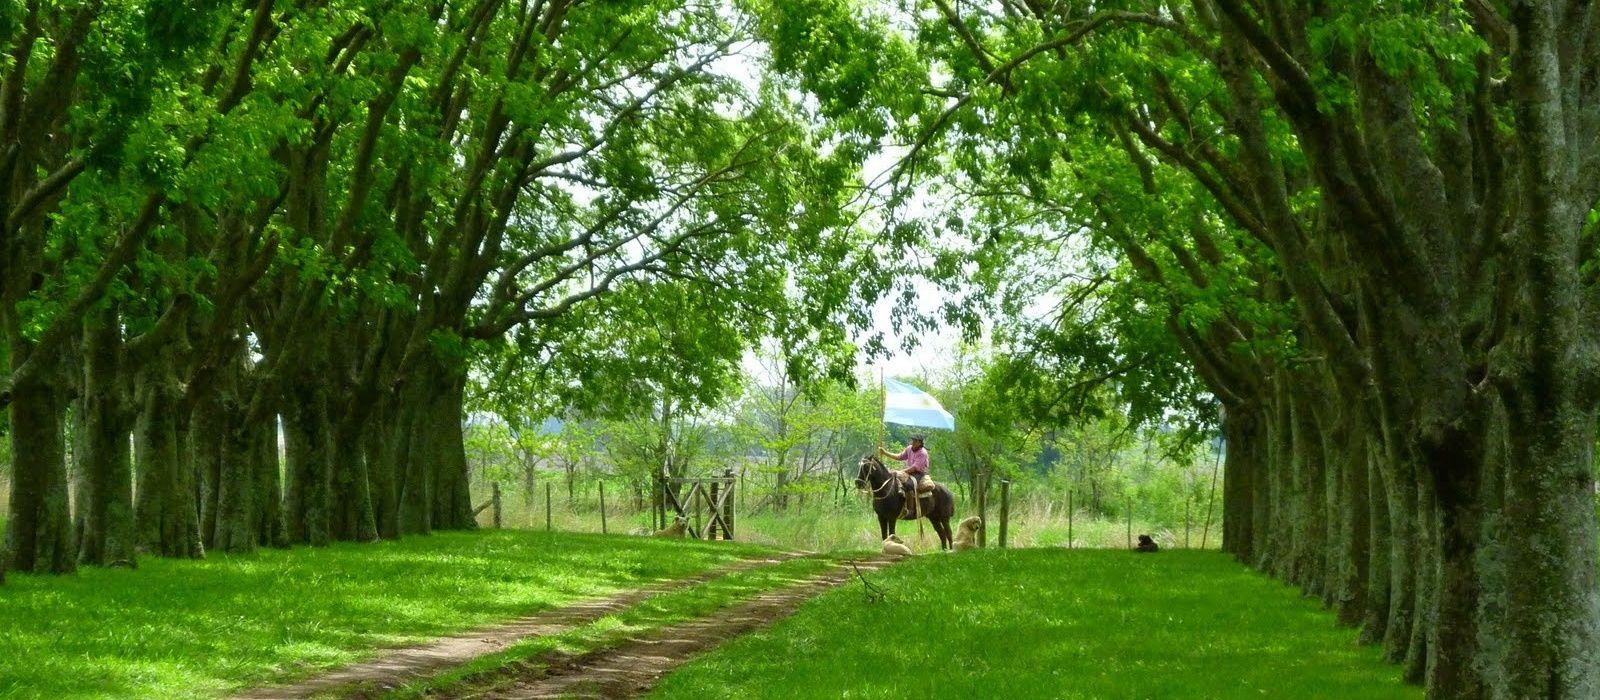 Destination Buenos Aires Province Argentina